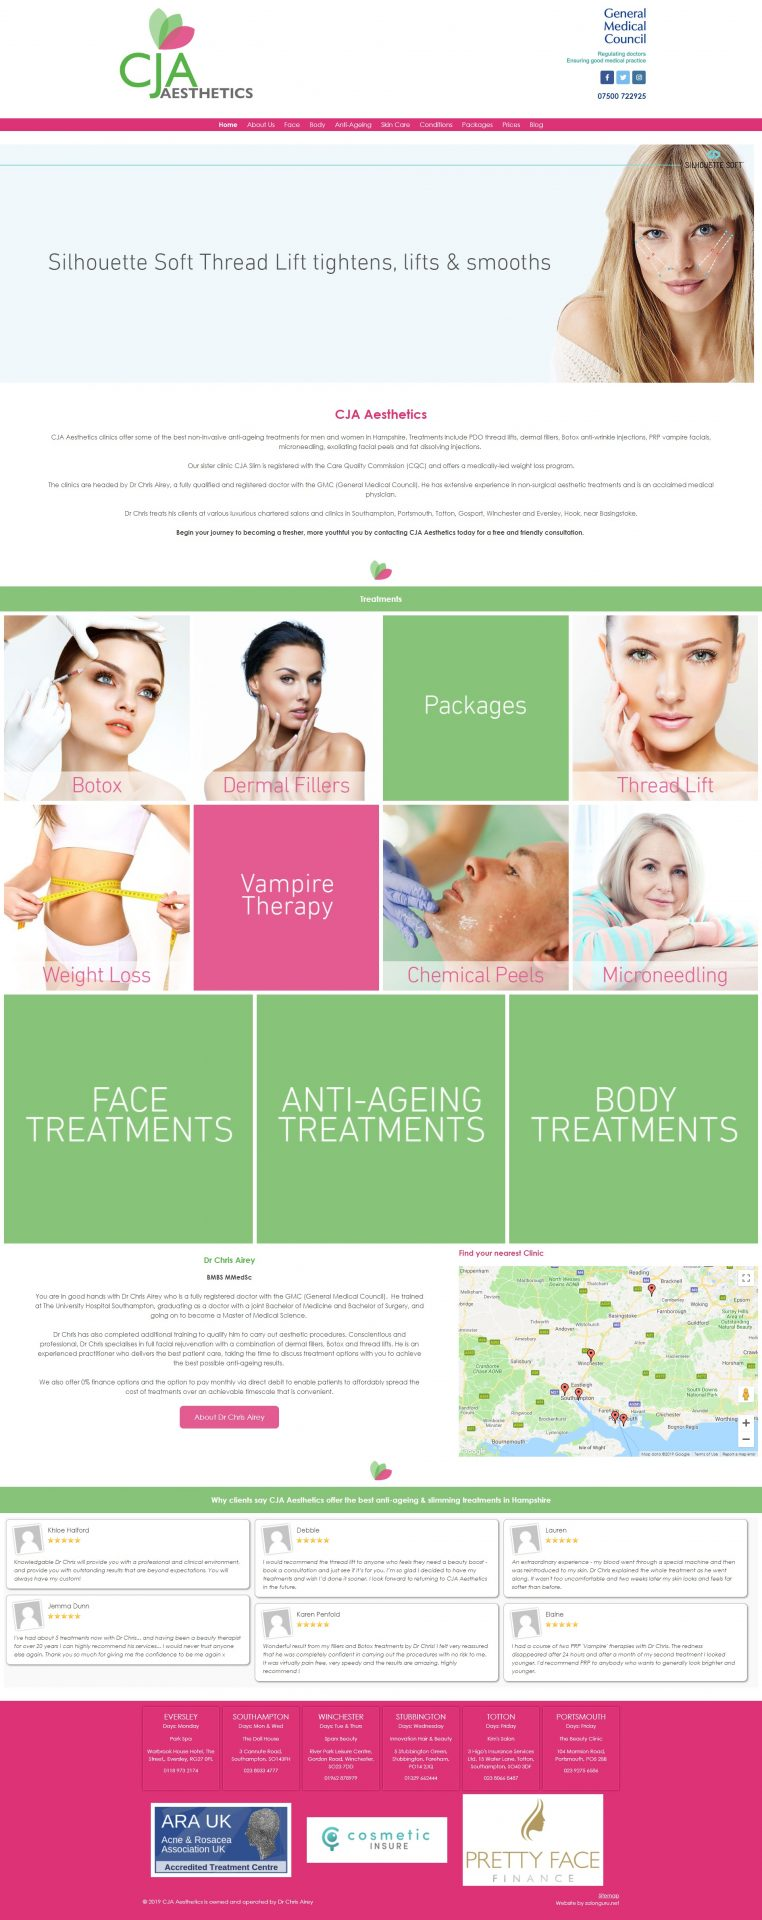 CJA Aesthetics website